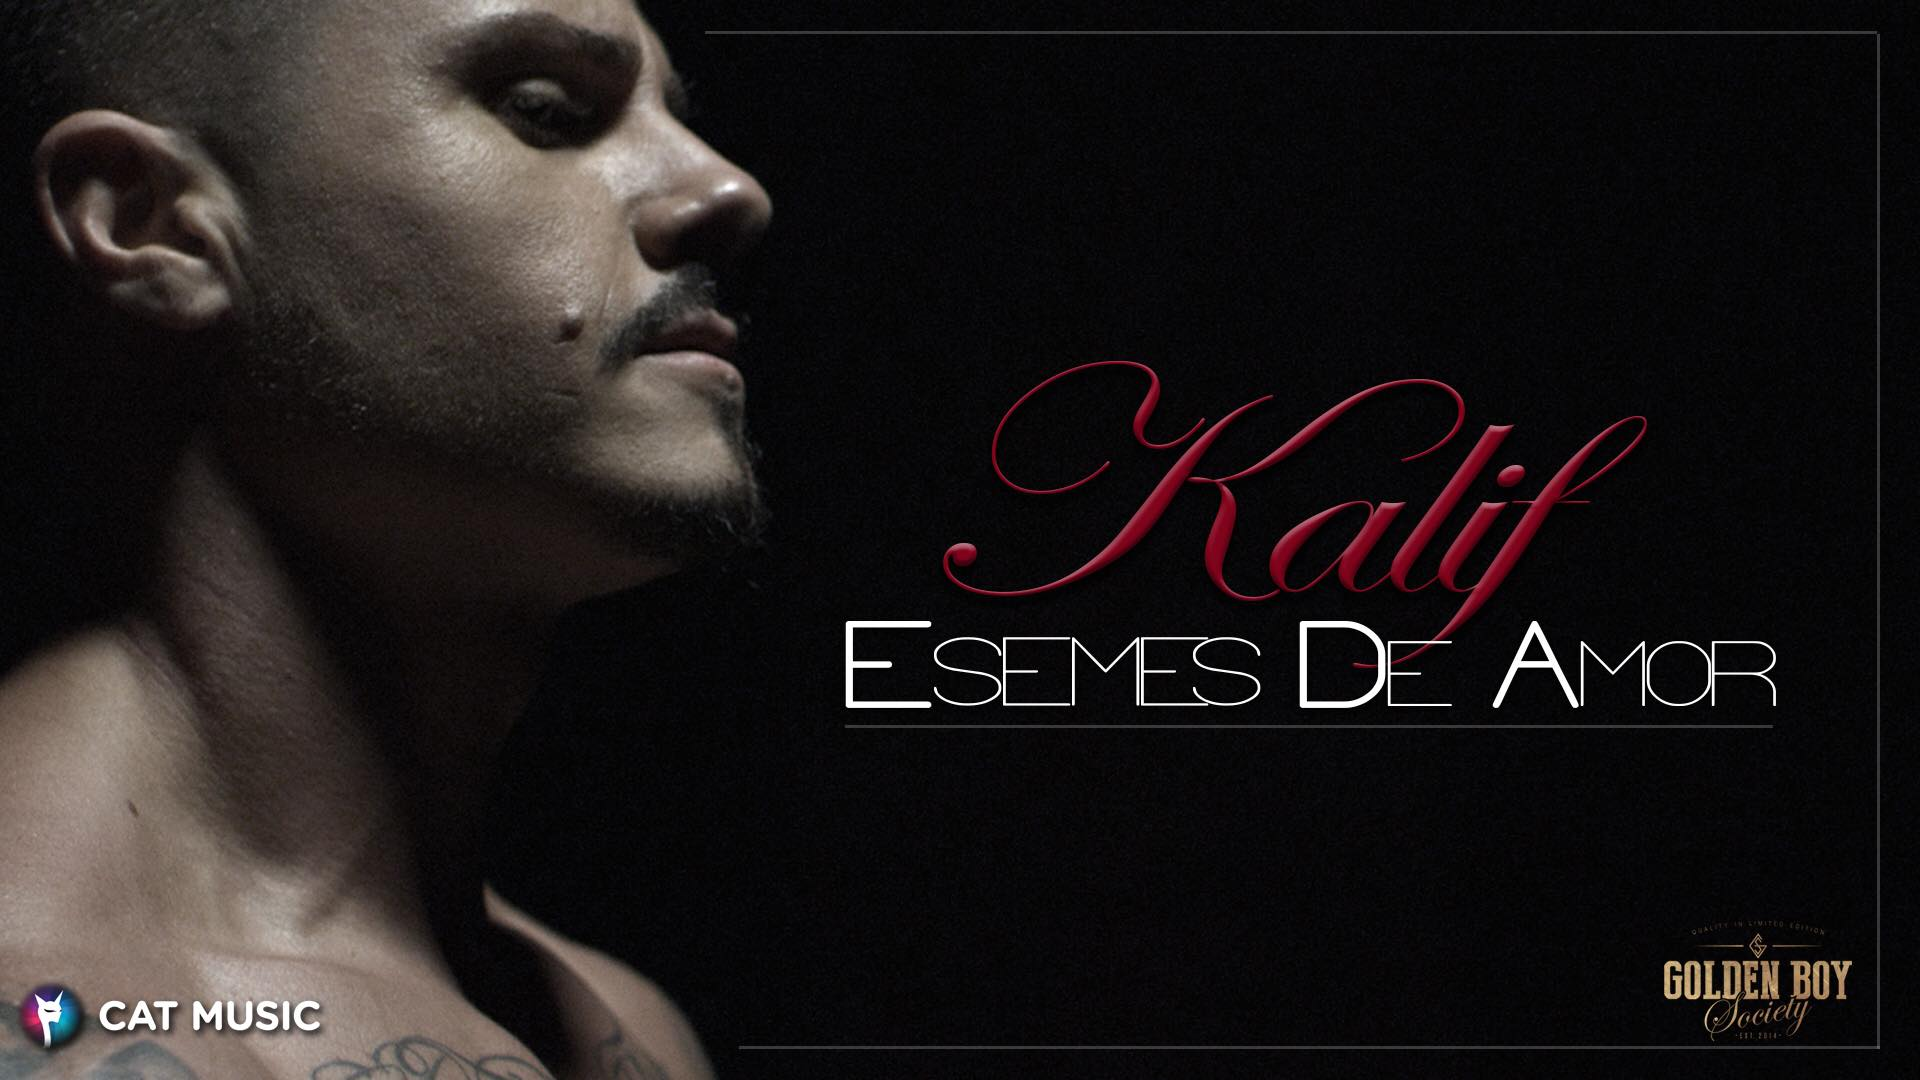 Kalif - Esemes de Amor